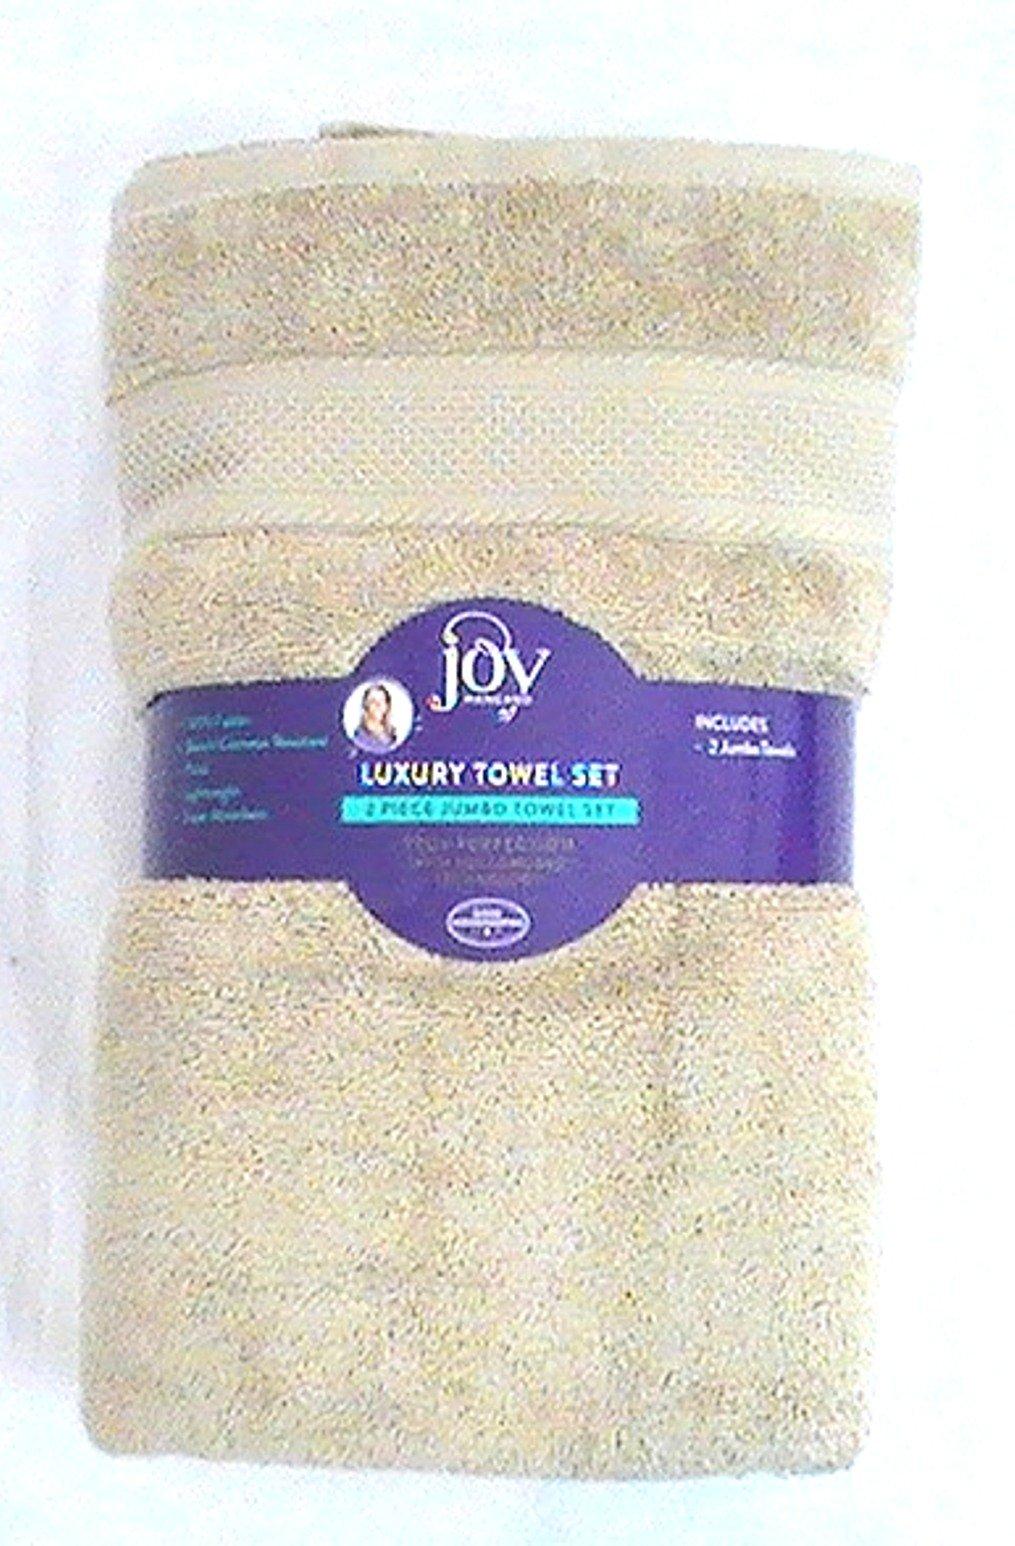 JOY 2 piece Jumbo Plush True Perfection Bleach-Resistant Luxurious Towels - Linen Driftwood